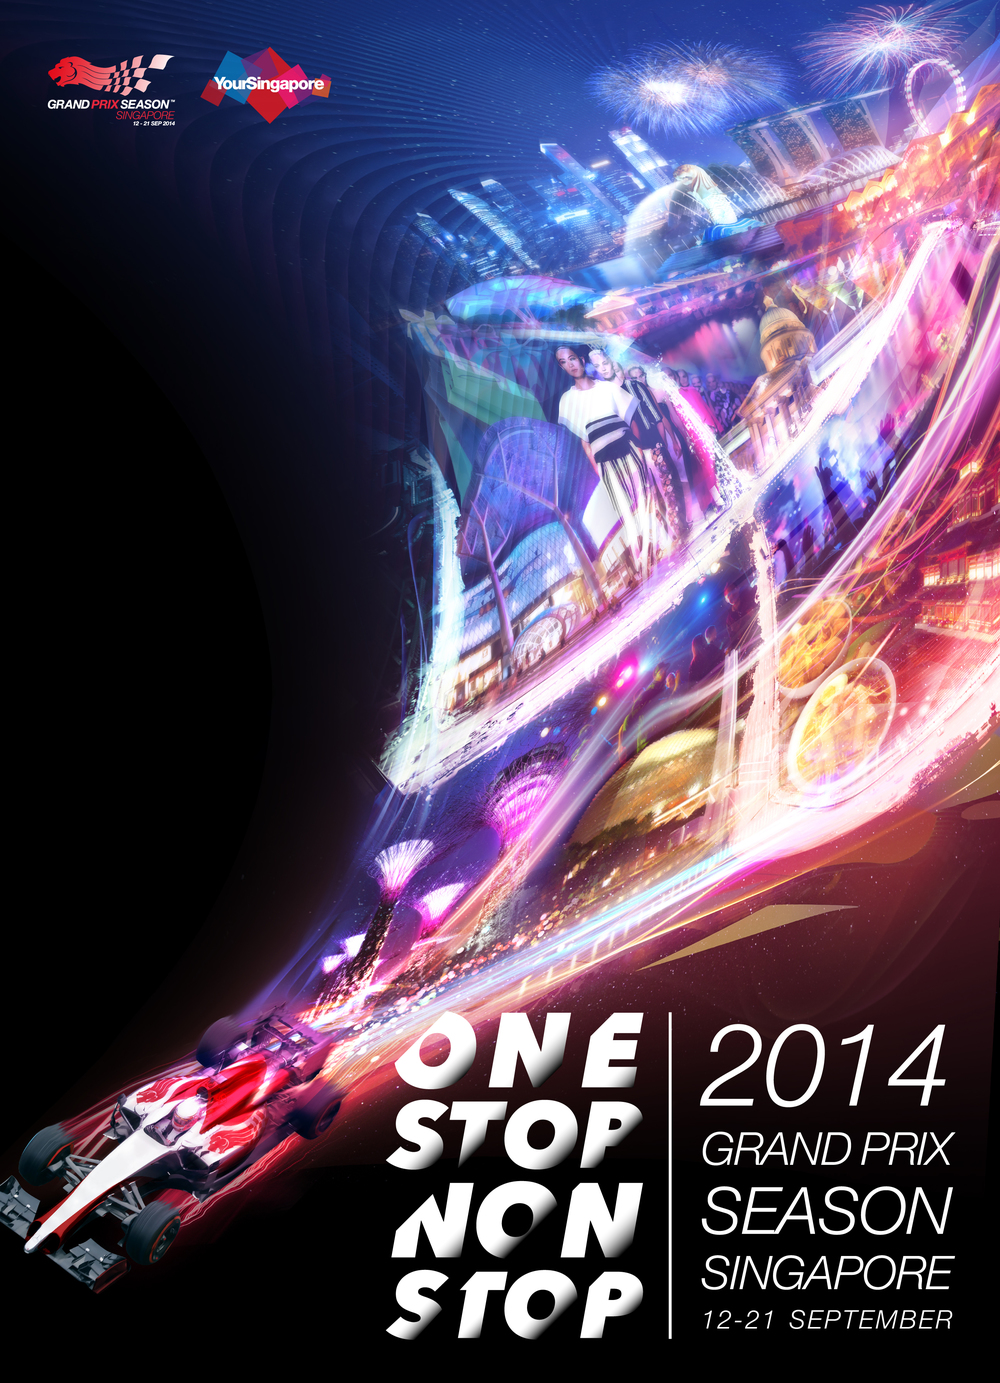 outeredit - f1 grand prix season singapore - key visual